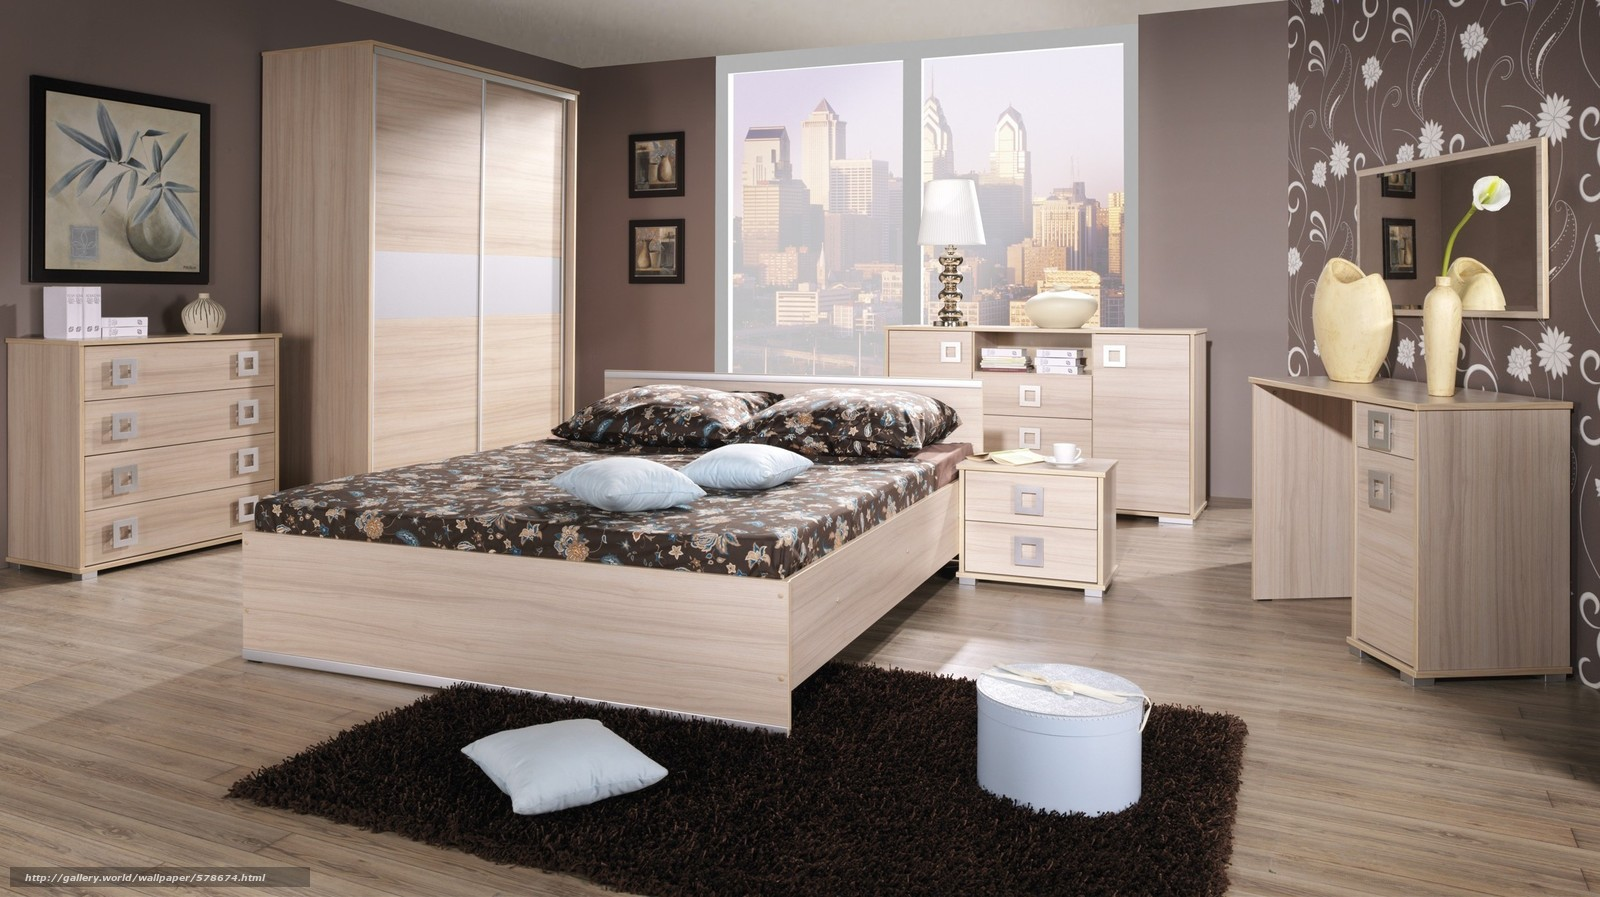 Фото дизайна комнат с обоями